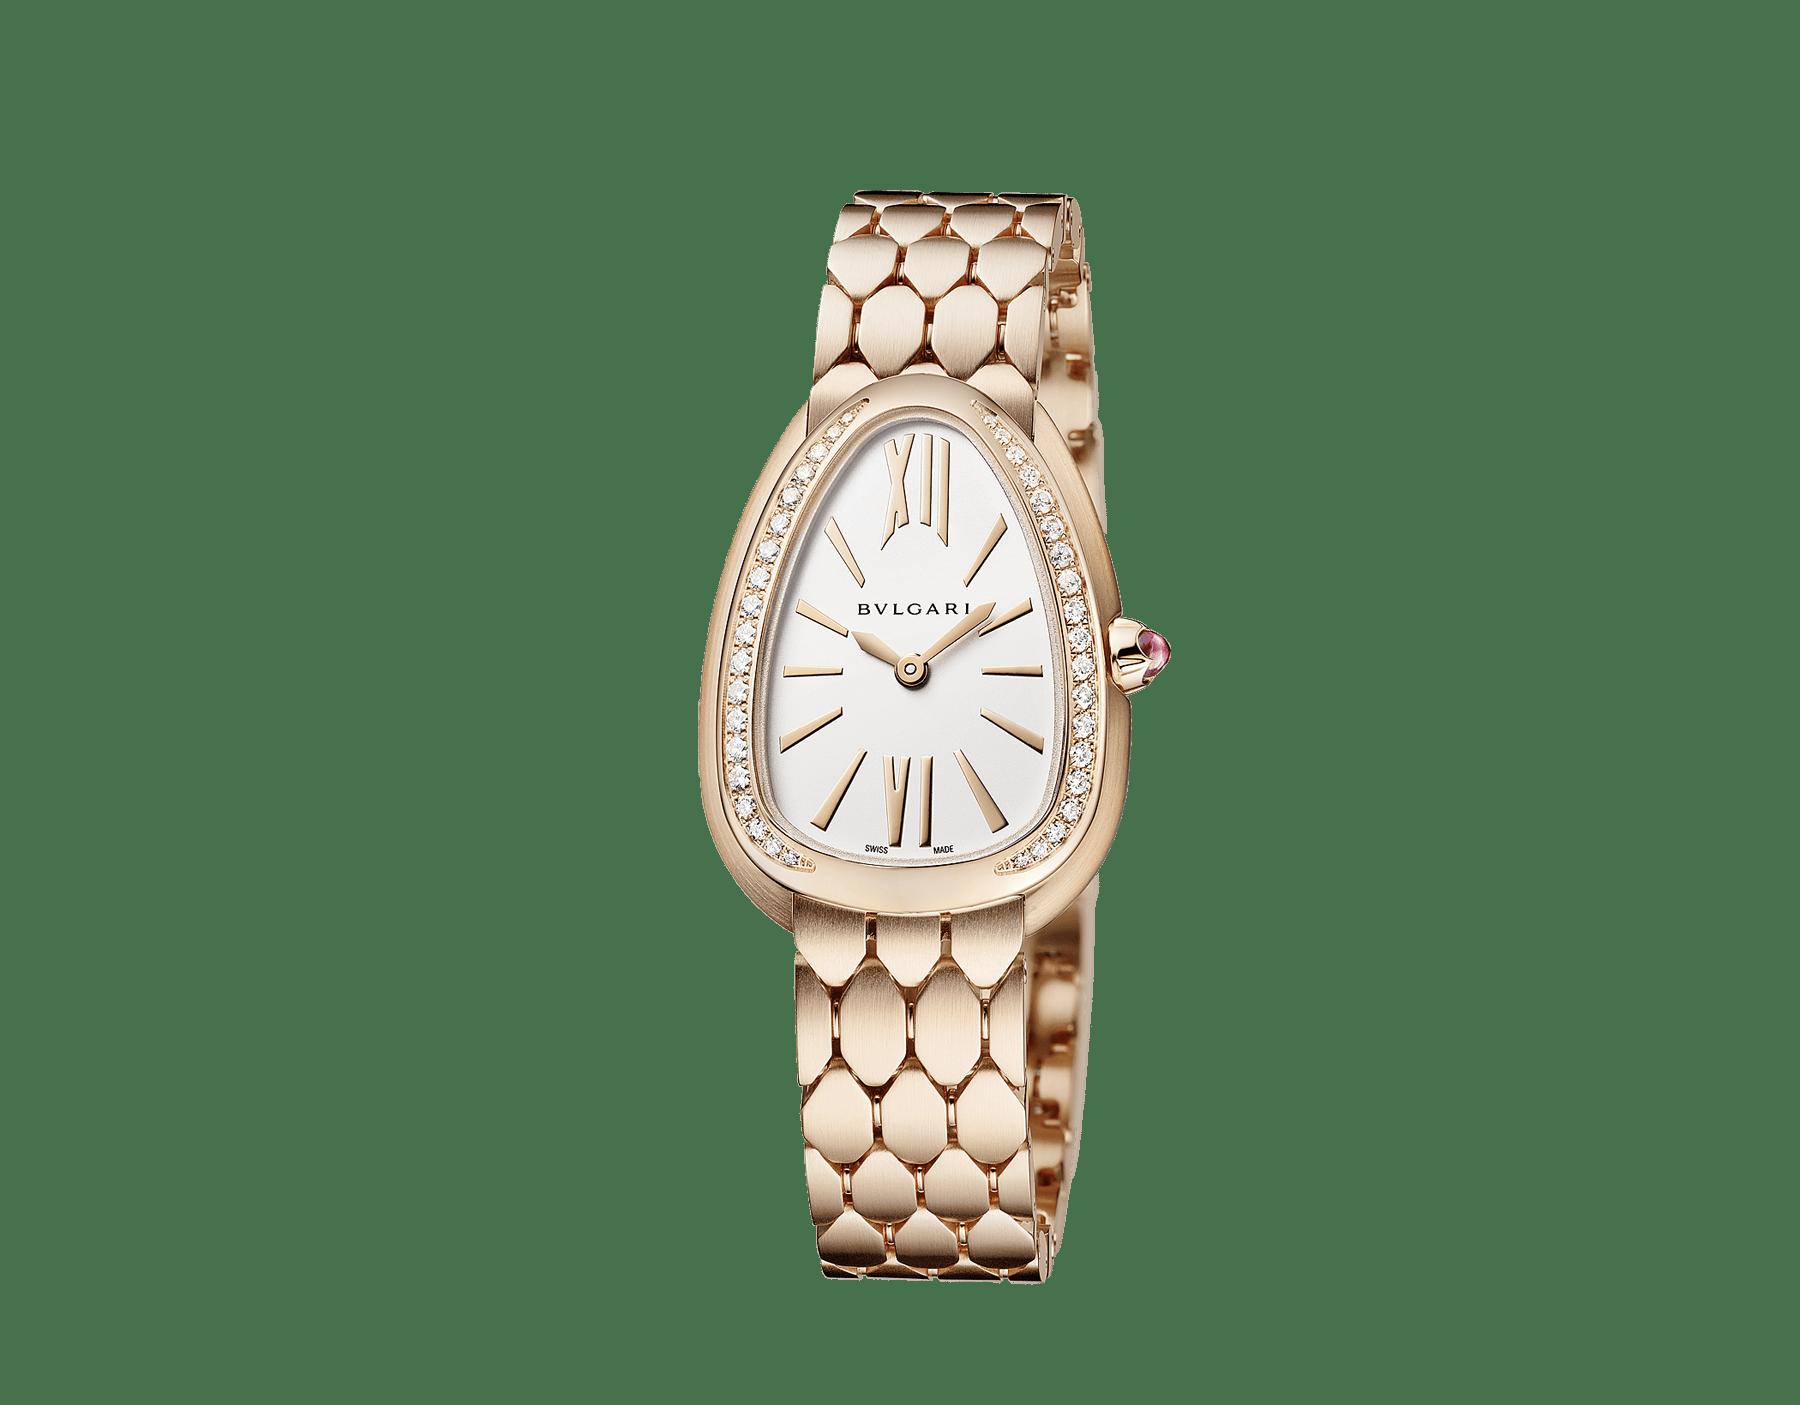 Serpenti Seduttori 腕錶,18K 玫瑰金錶殼和錶圈鑲飾鑽石,銀白色蛋白石錶盤,18K 玫瑰金髮絲紋錶帶。 103169 image 2